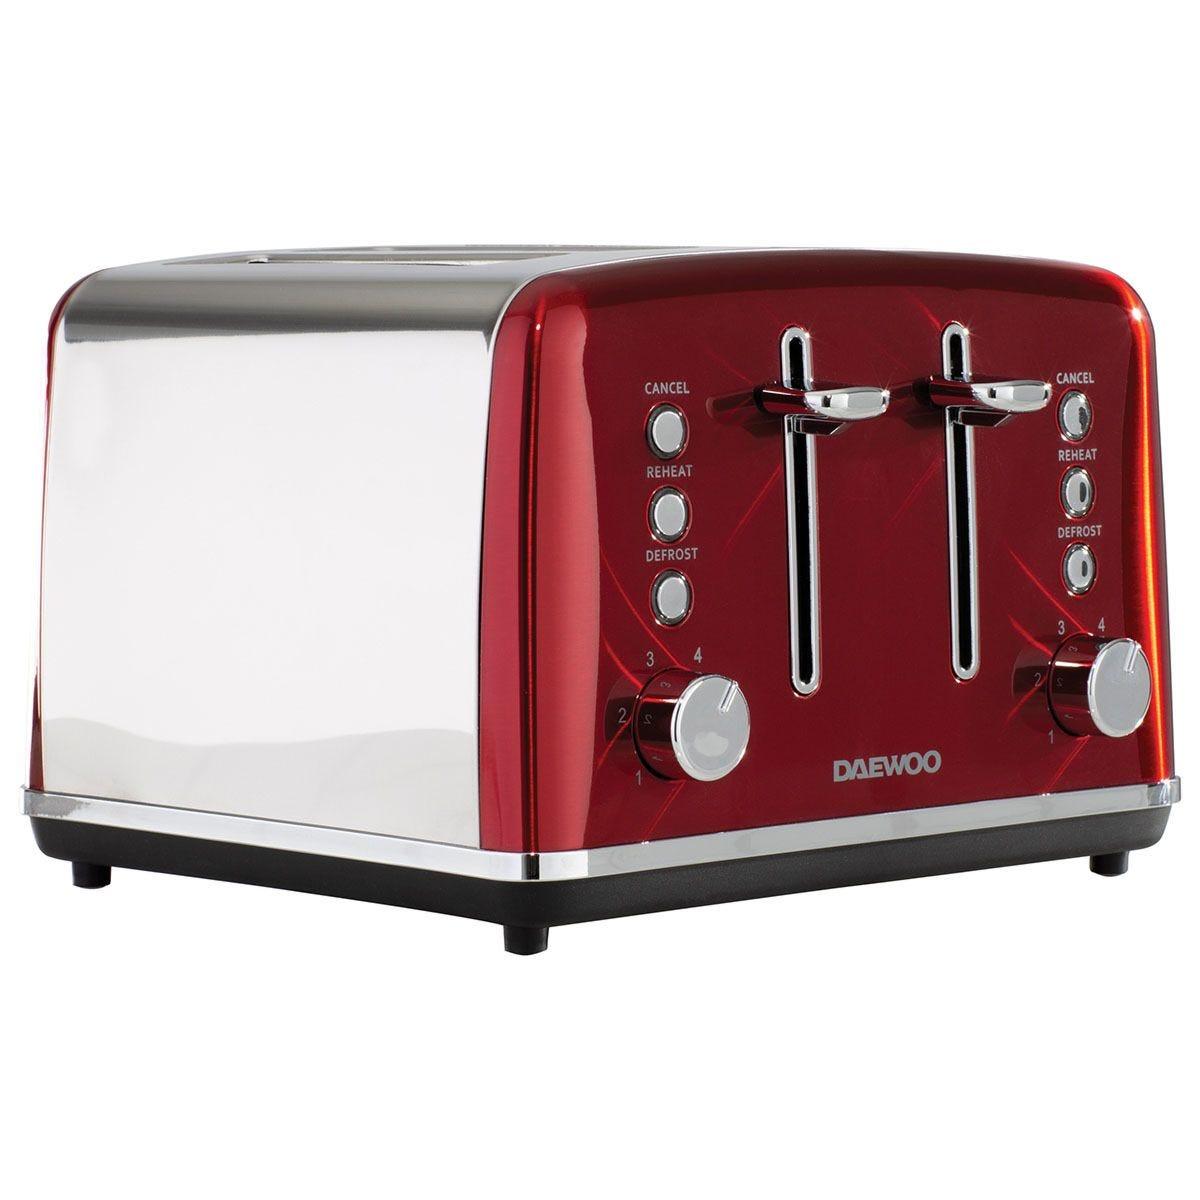 Daewoo Kensington 4-Slice Toaster - Red